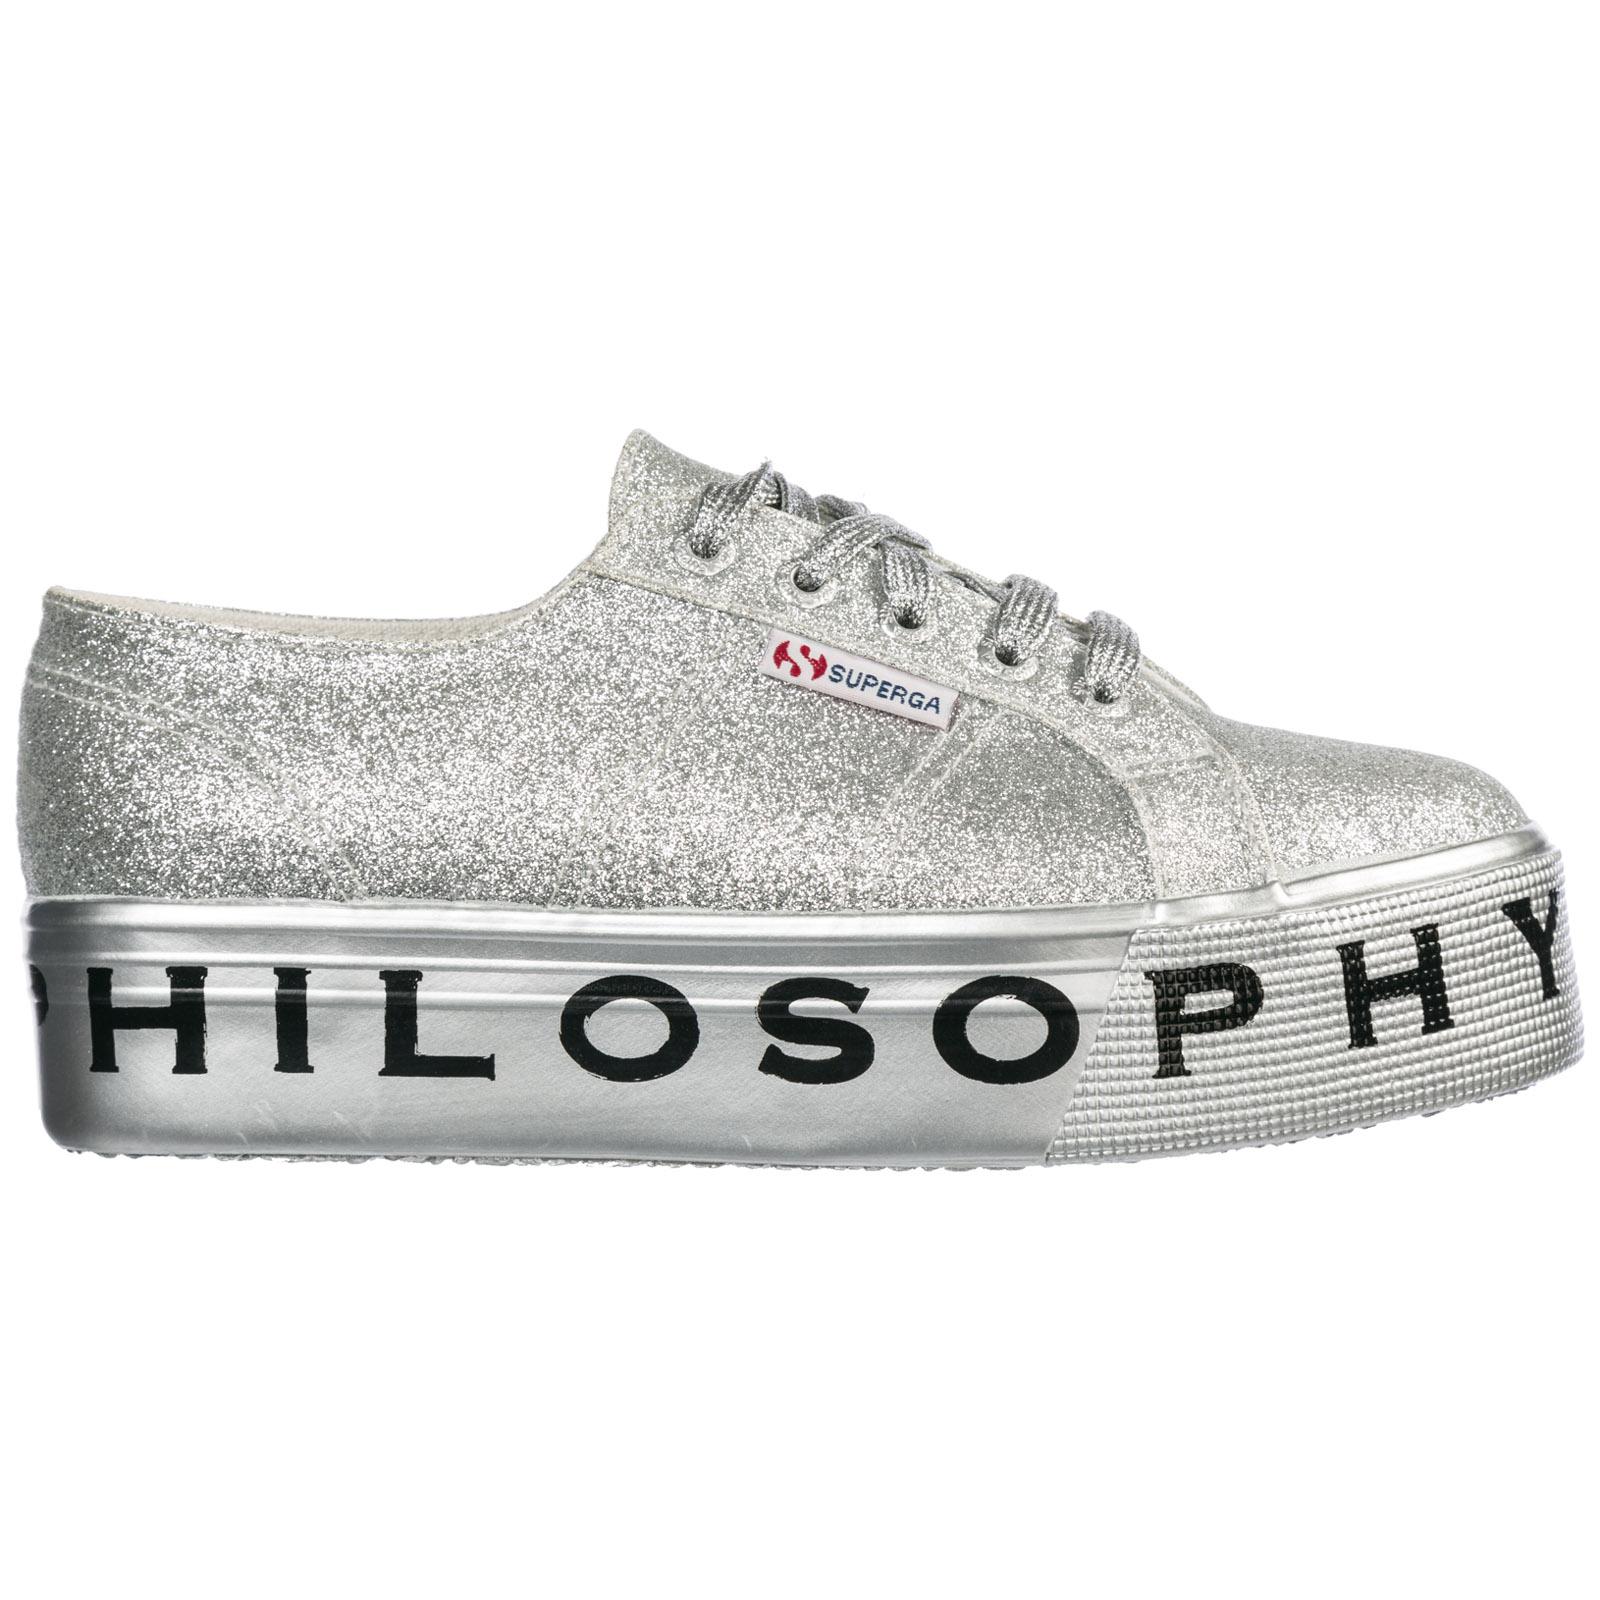 Sneakers Philosophy di Lorenzo Serafini